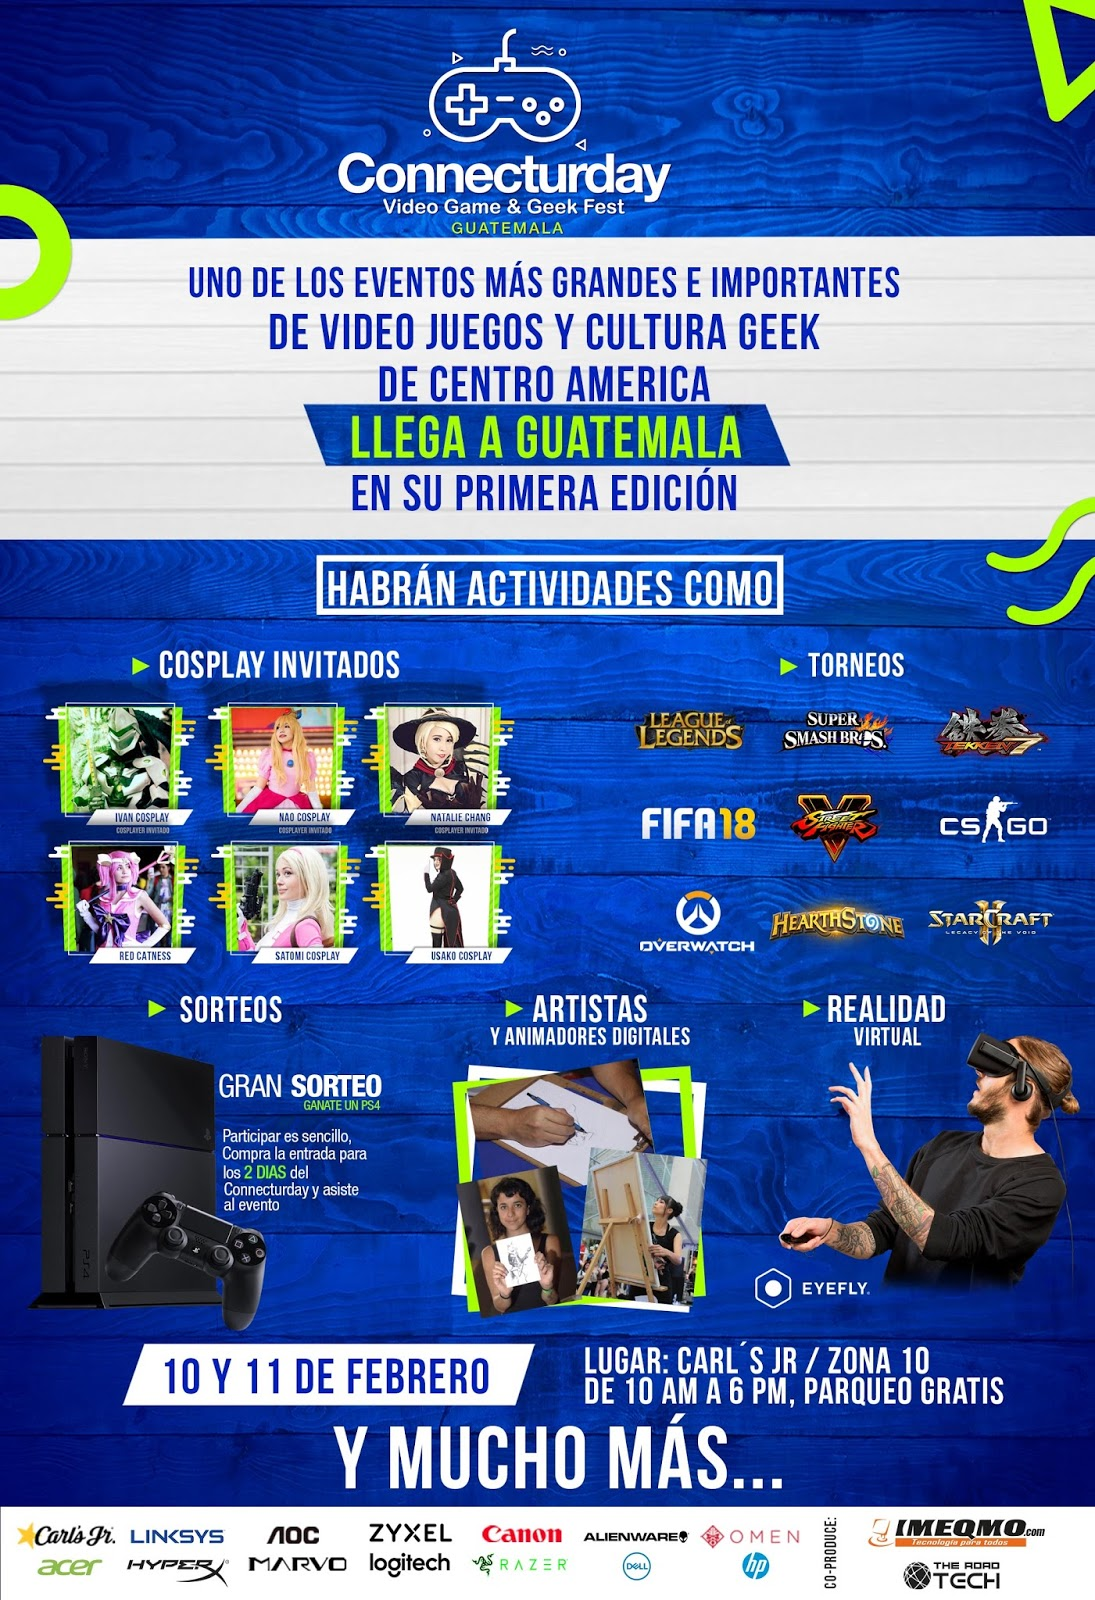 Connecturday Llega A Guatemala Este 10 De Febrero Revista Level